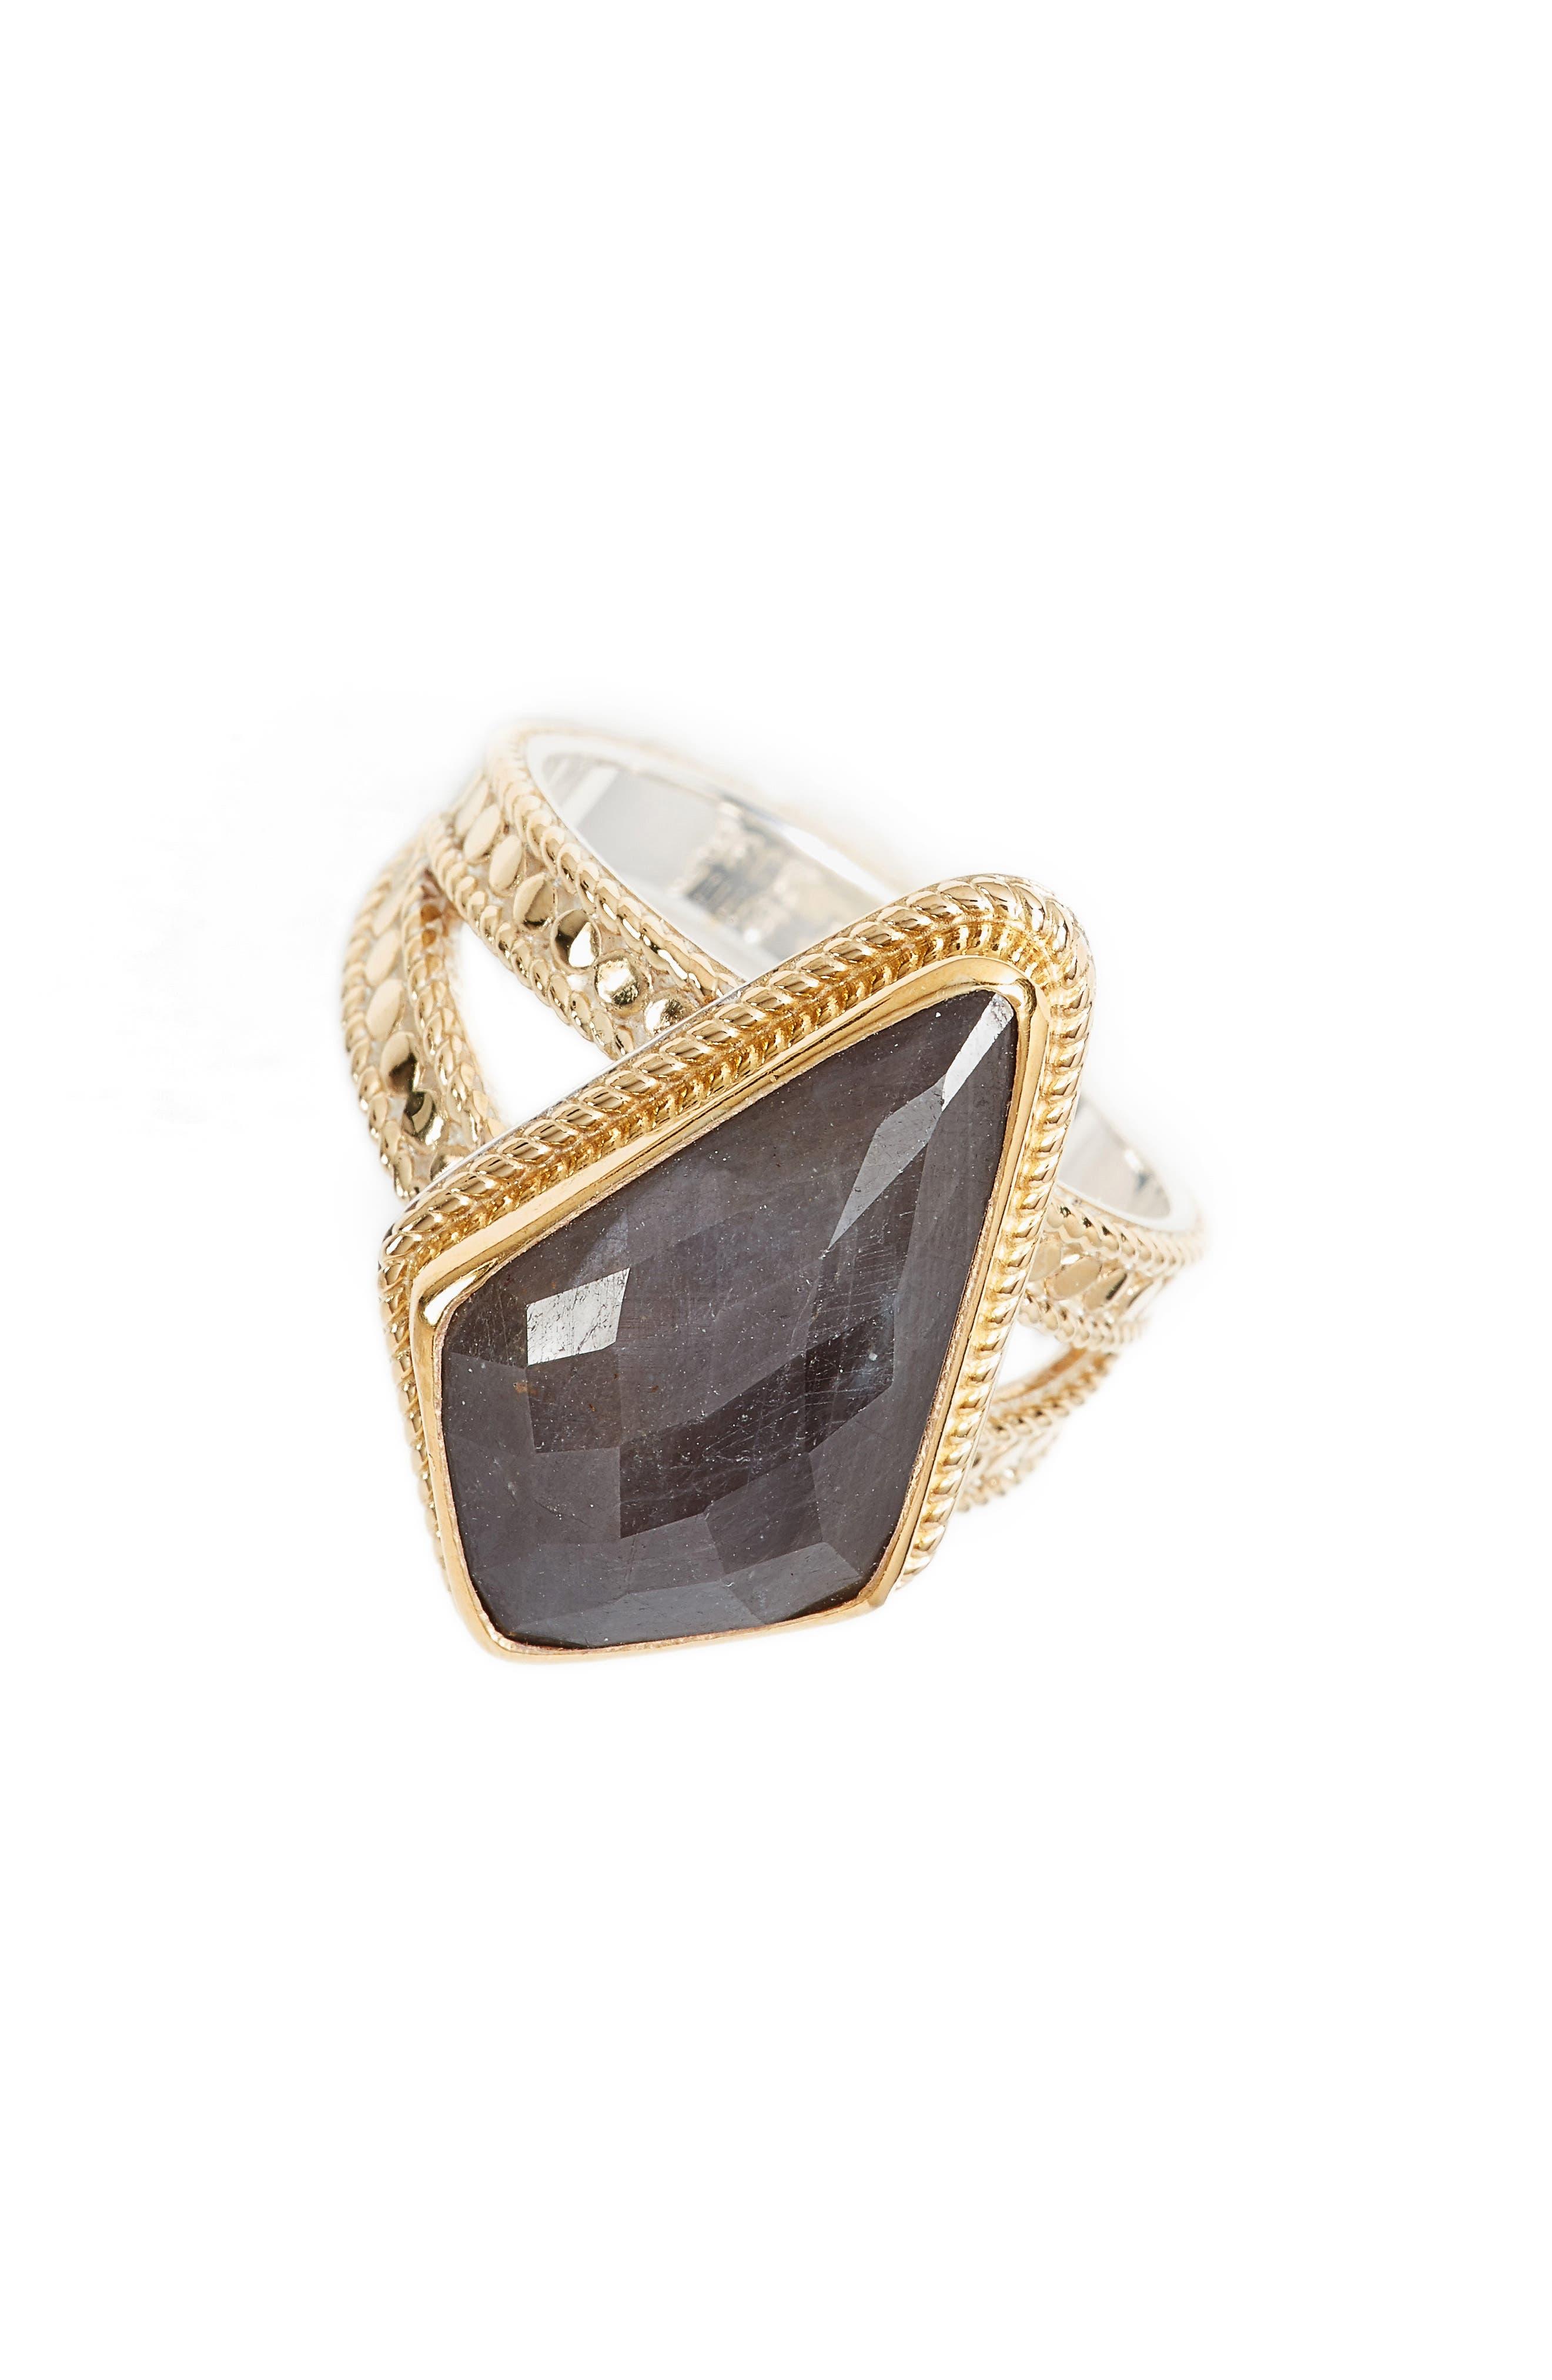 Main Image - Anna Beck Grey Sapphire Kite Ring